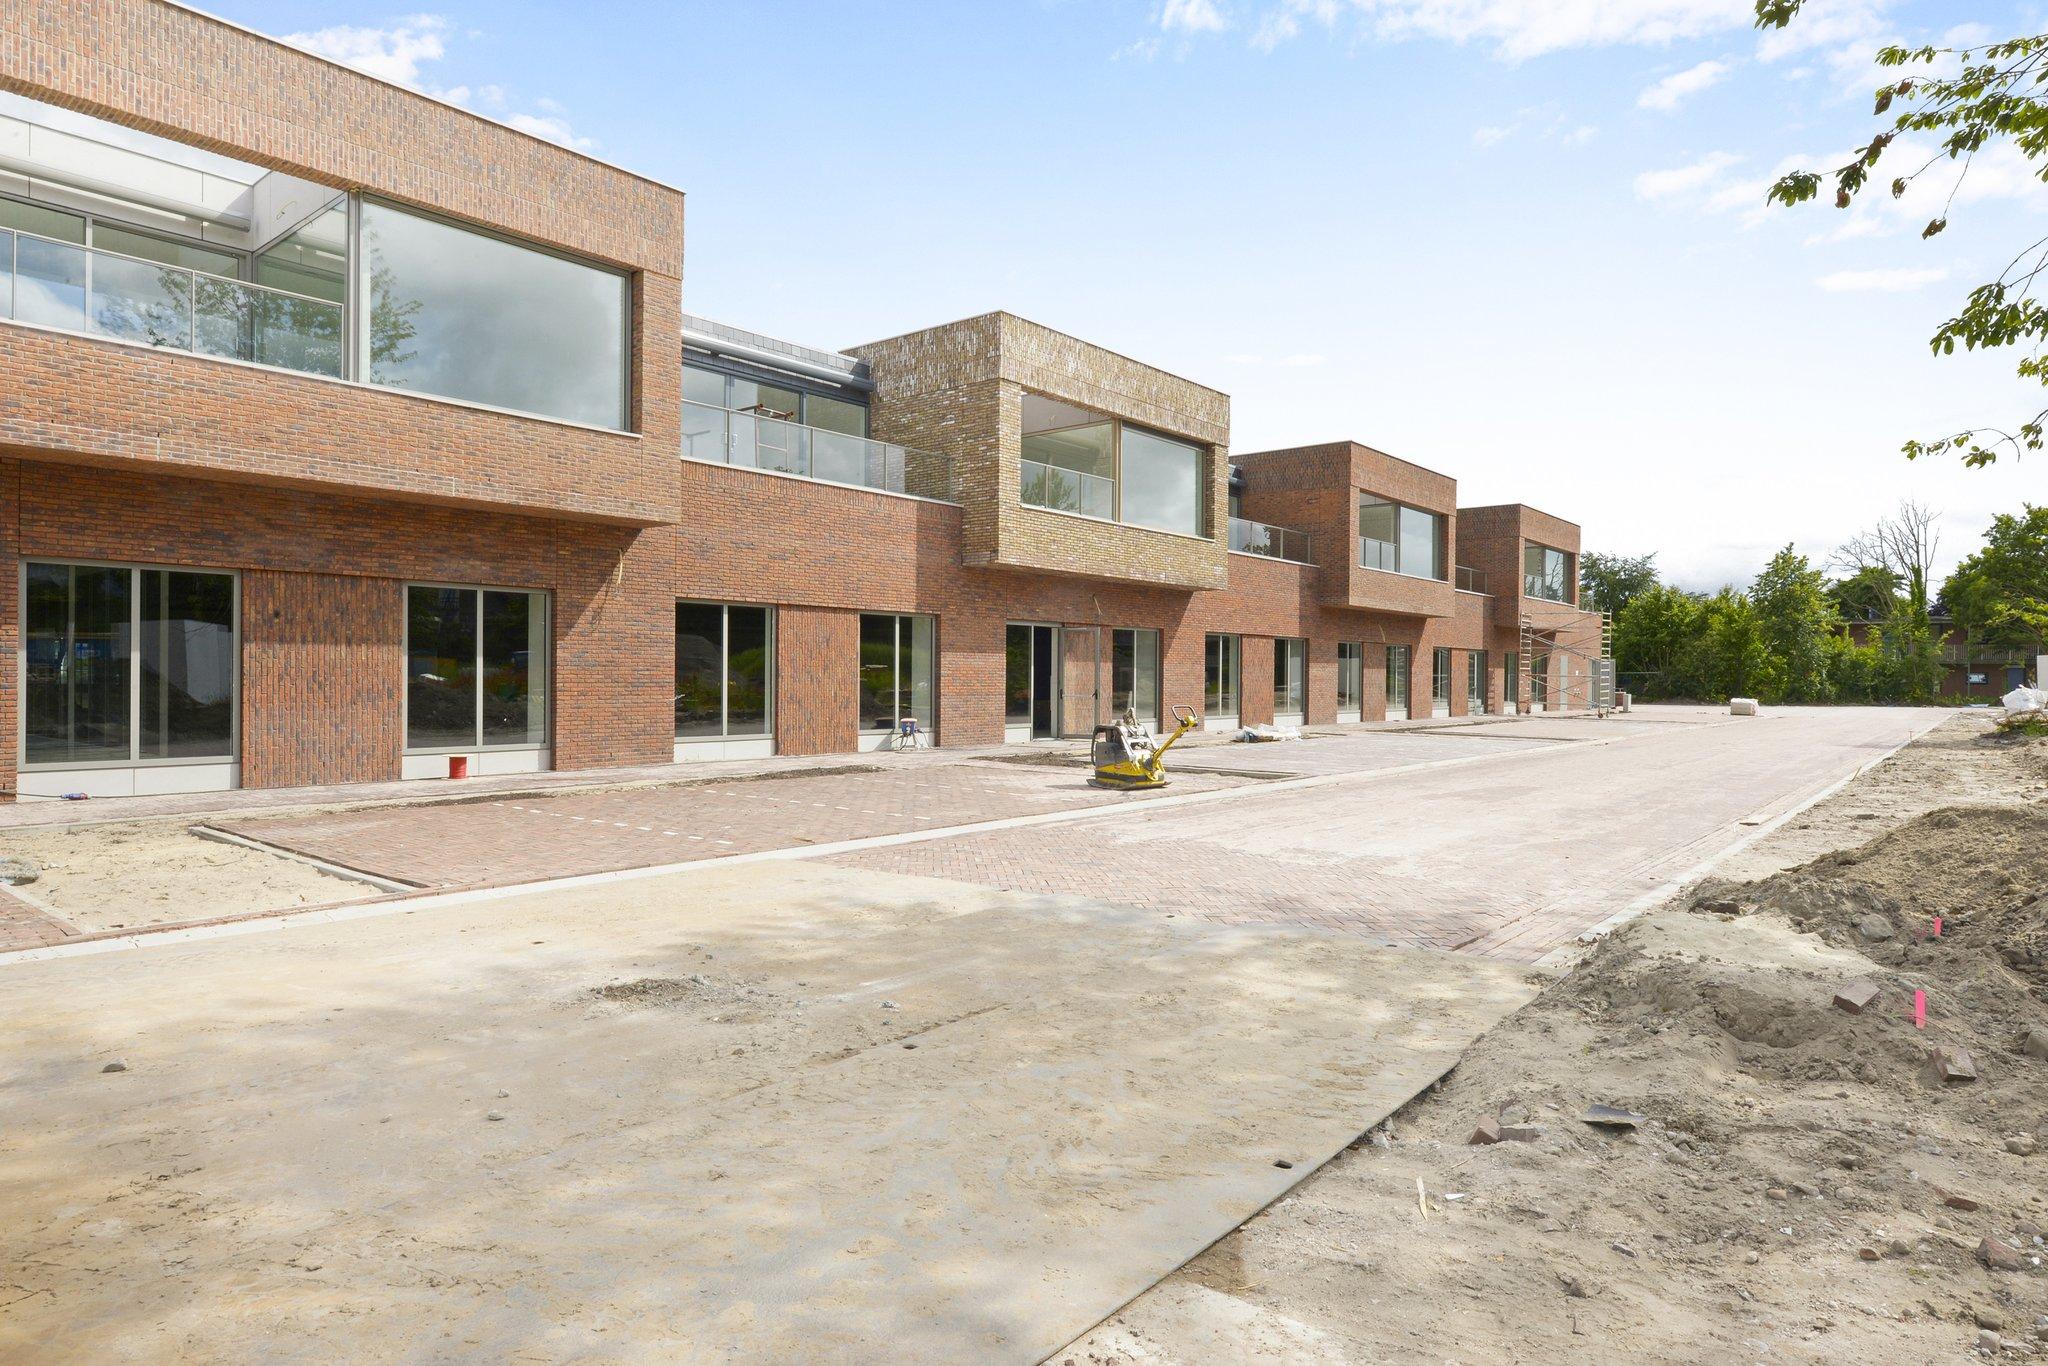 Te huur : Appartement Blekersveld 31 in Santpoort-Zuid